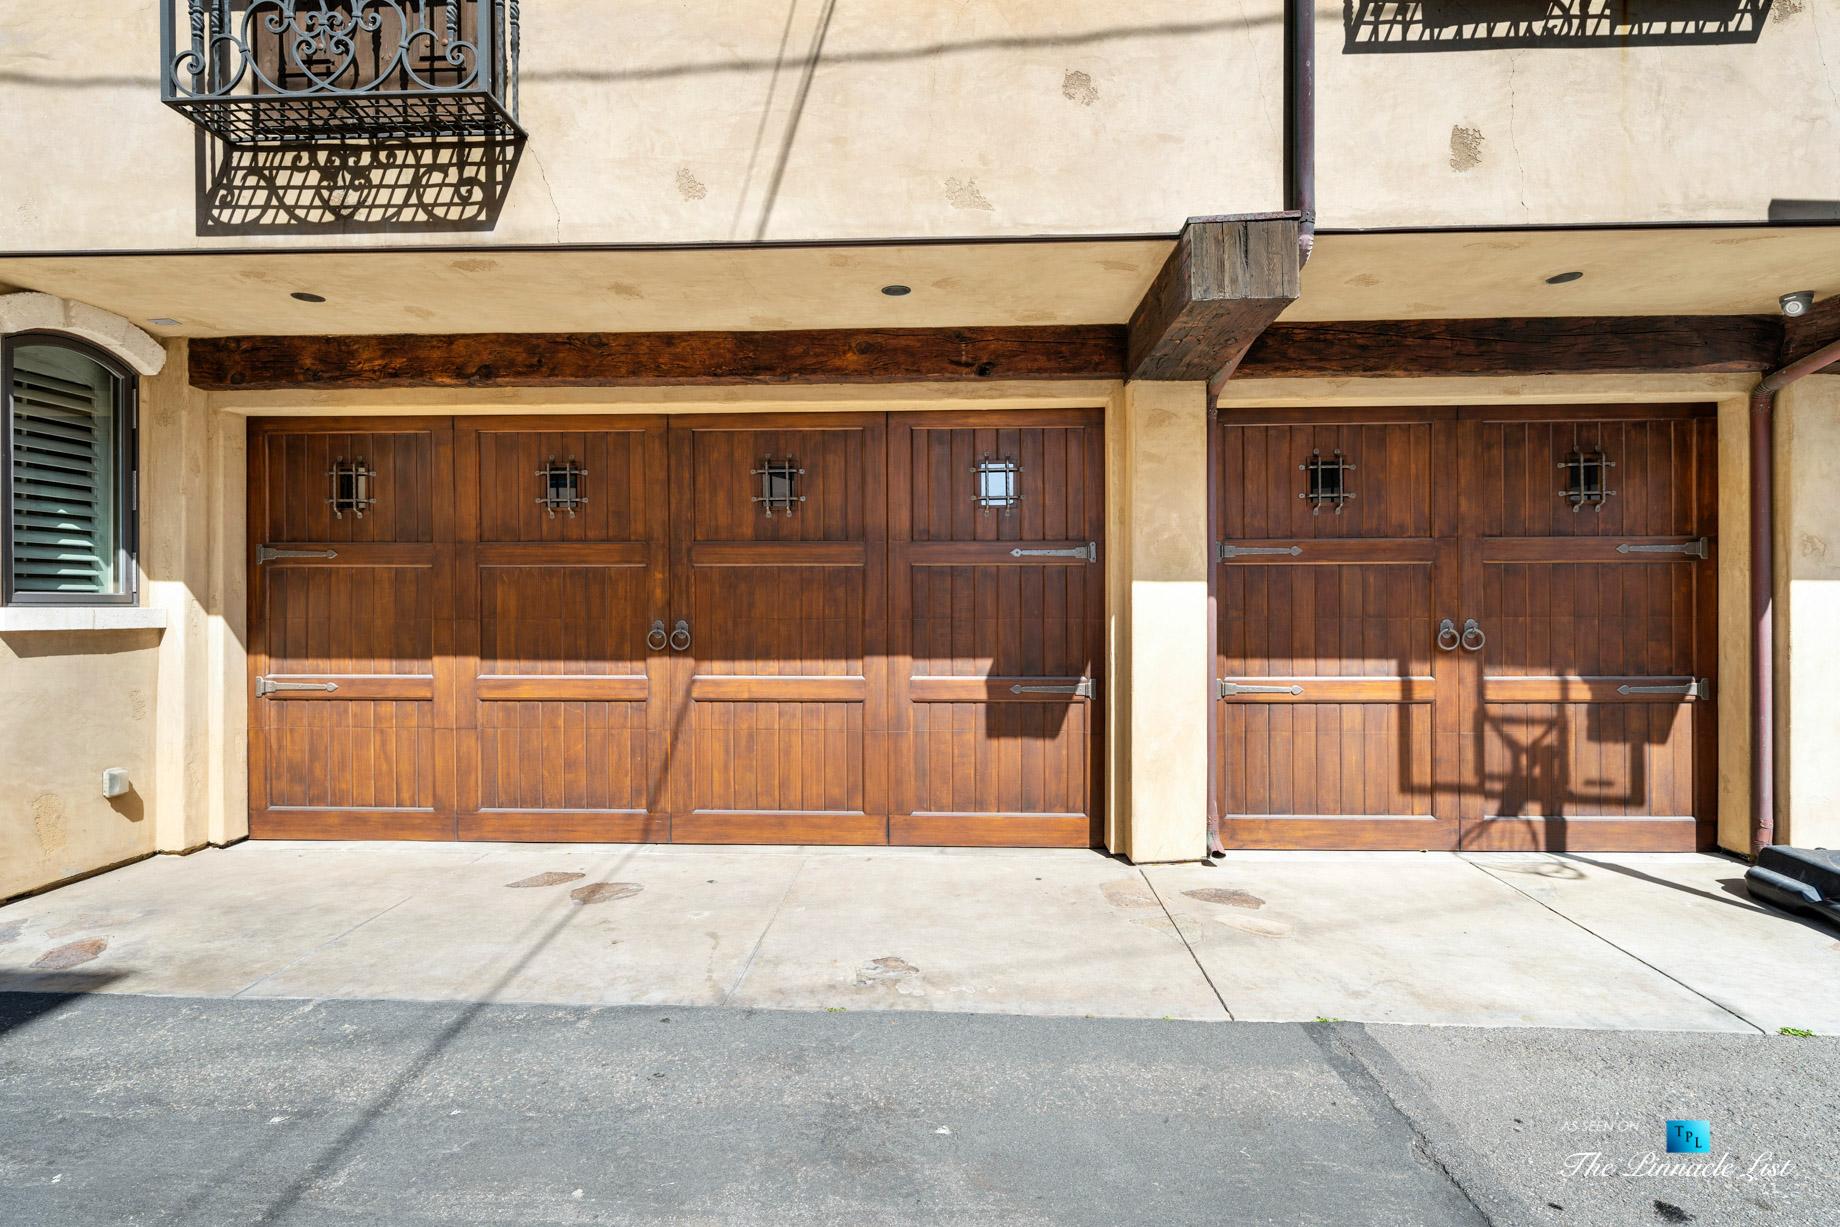 216 7th St, Manhattan Beach, CA, USA – Luxury Real Estate – Coastal Villa Home – House Rear Garage Doors